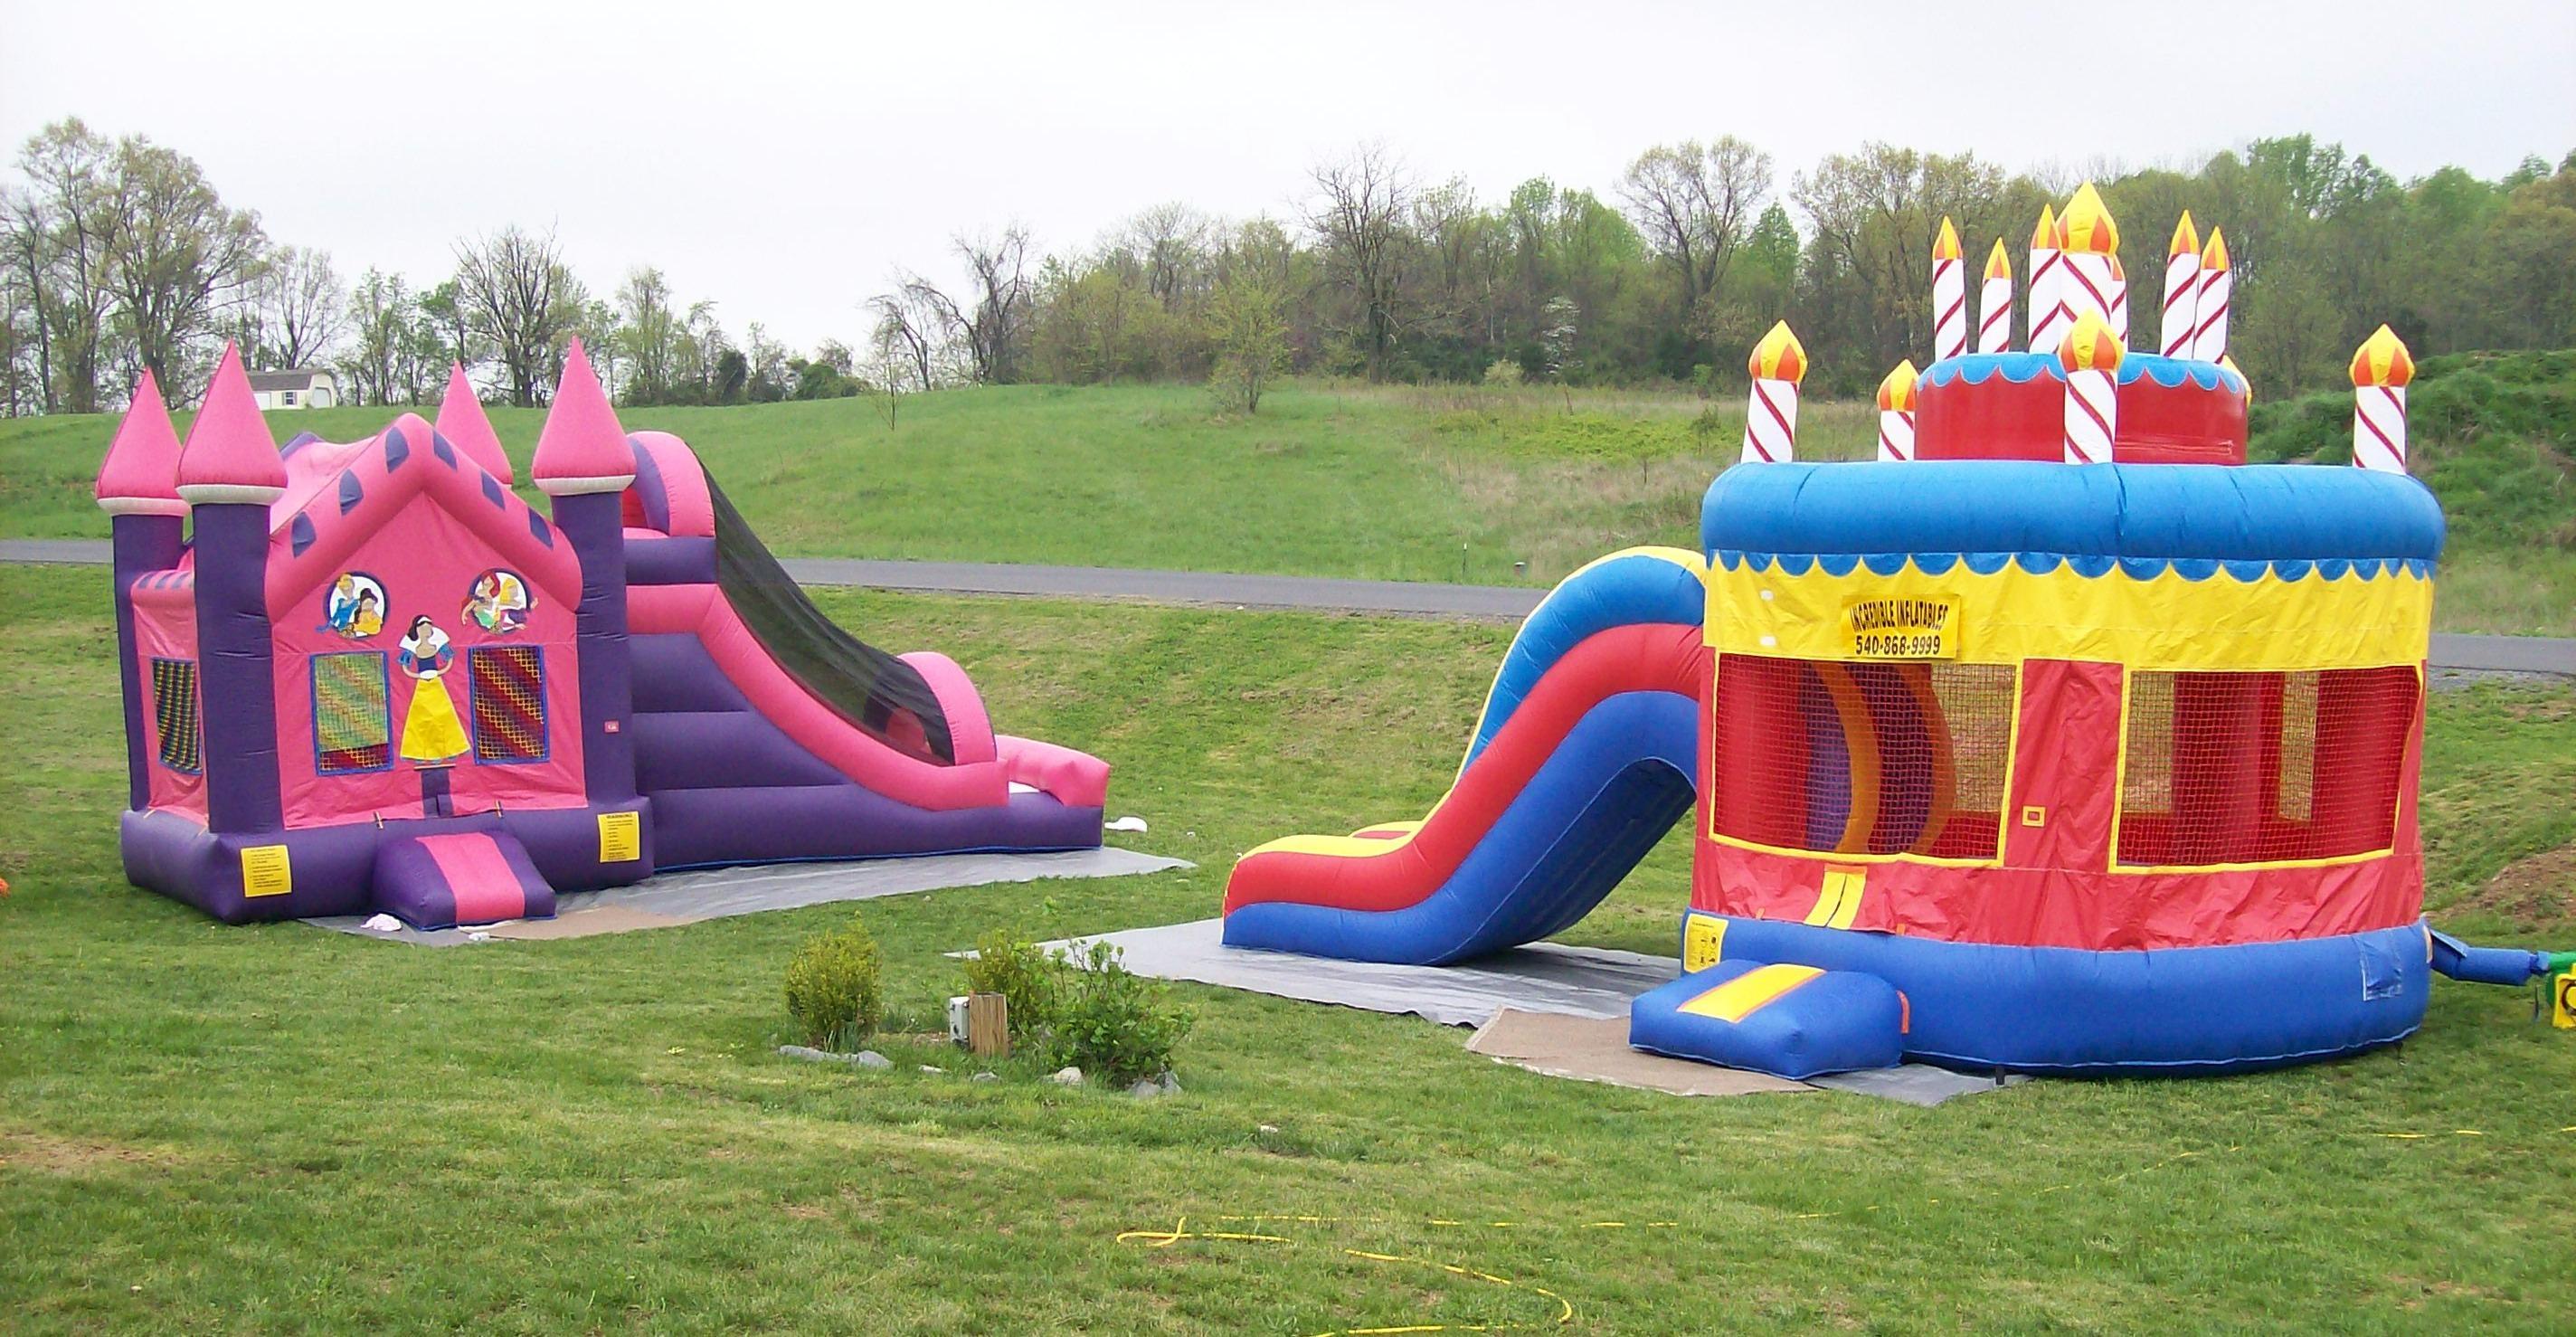 Incredible Inflatables LLC image 2